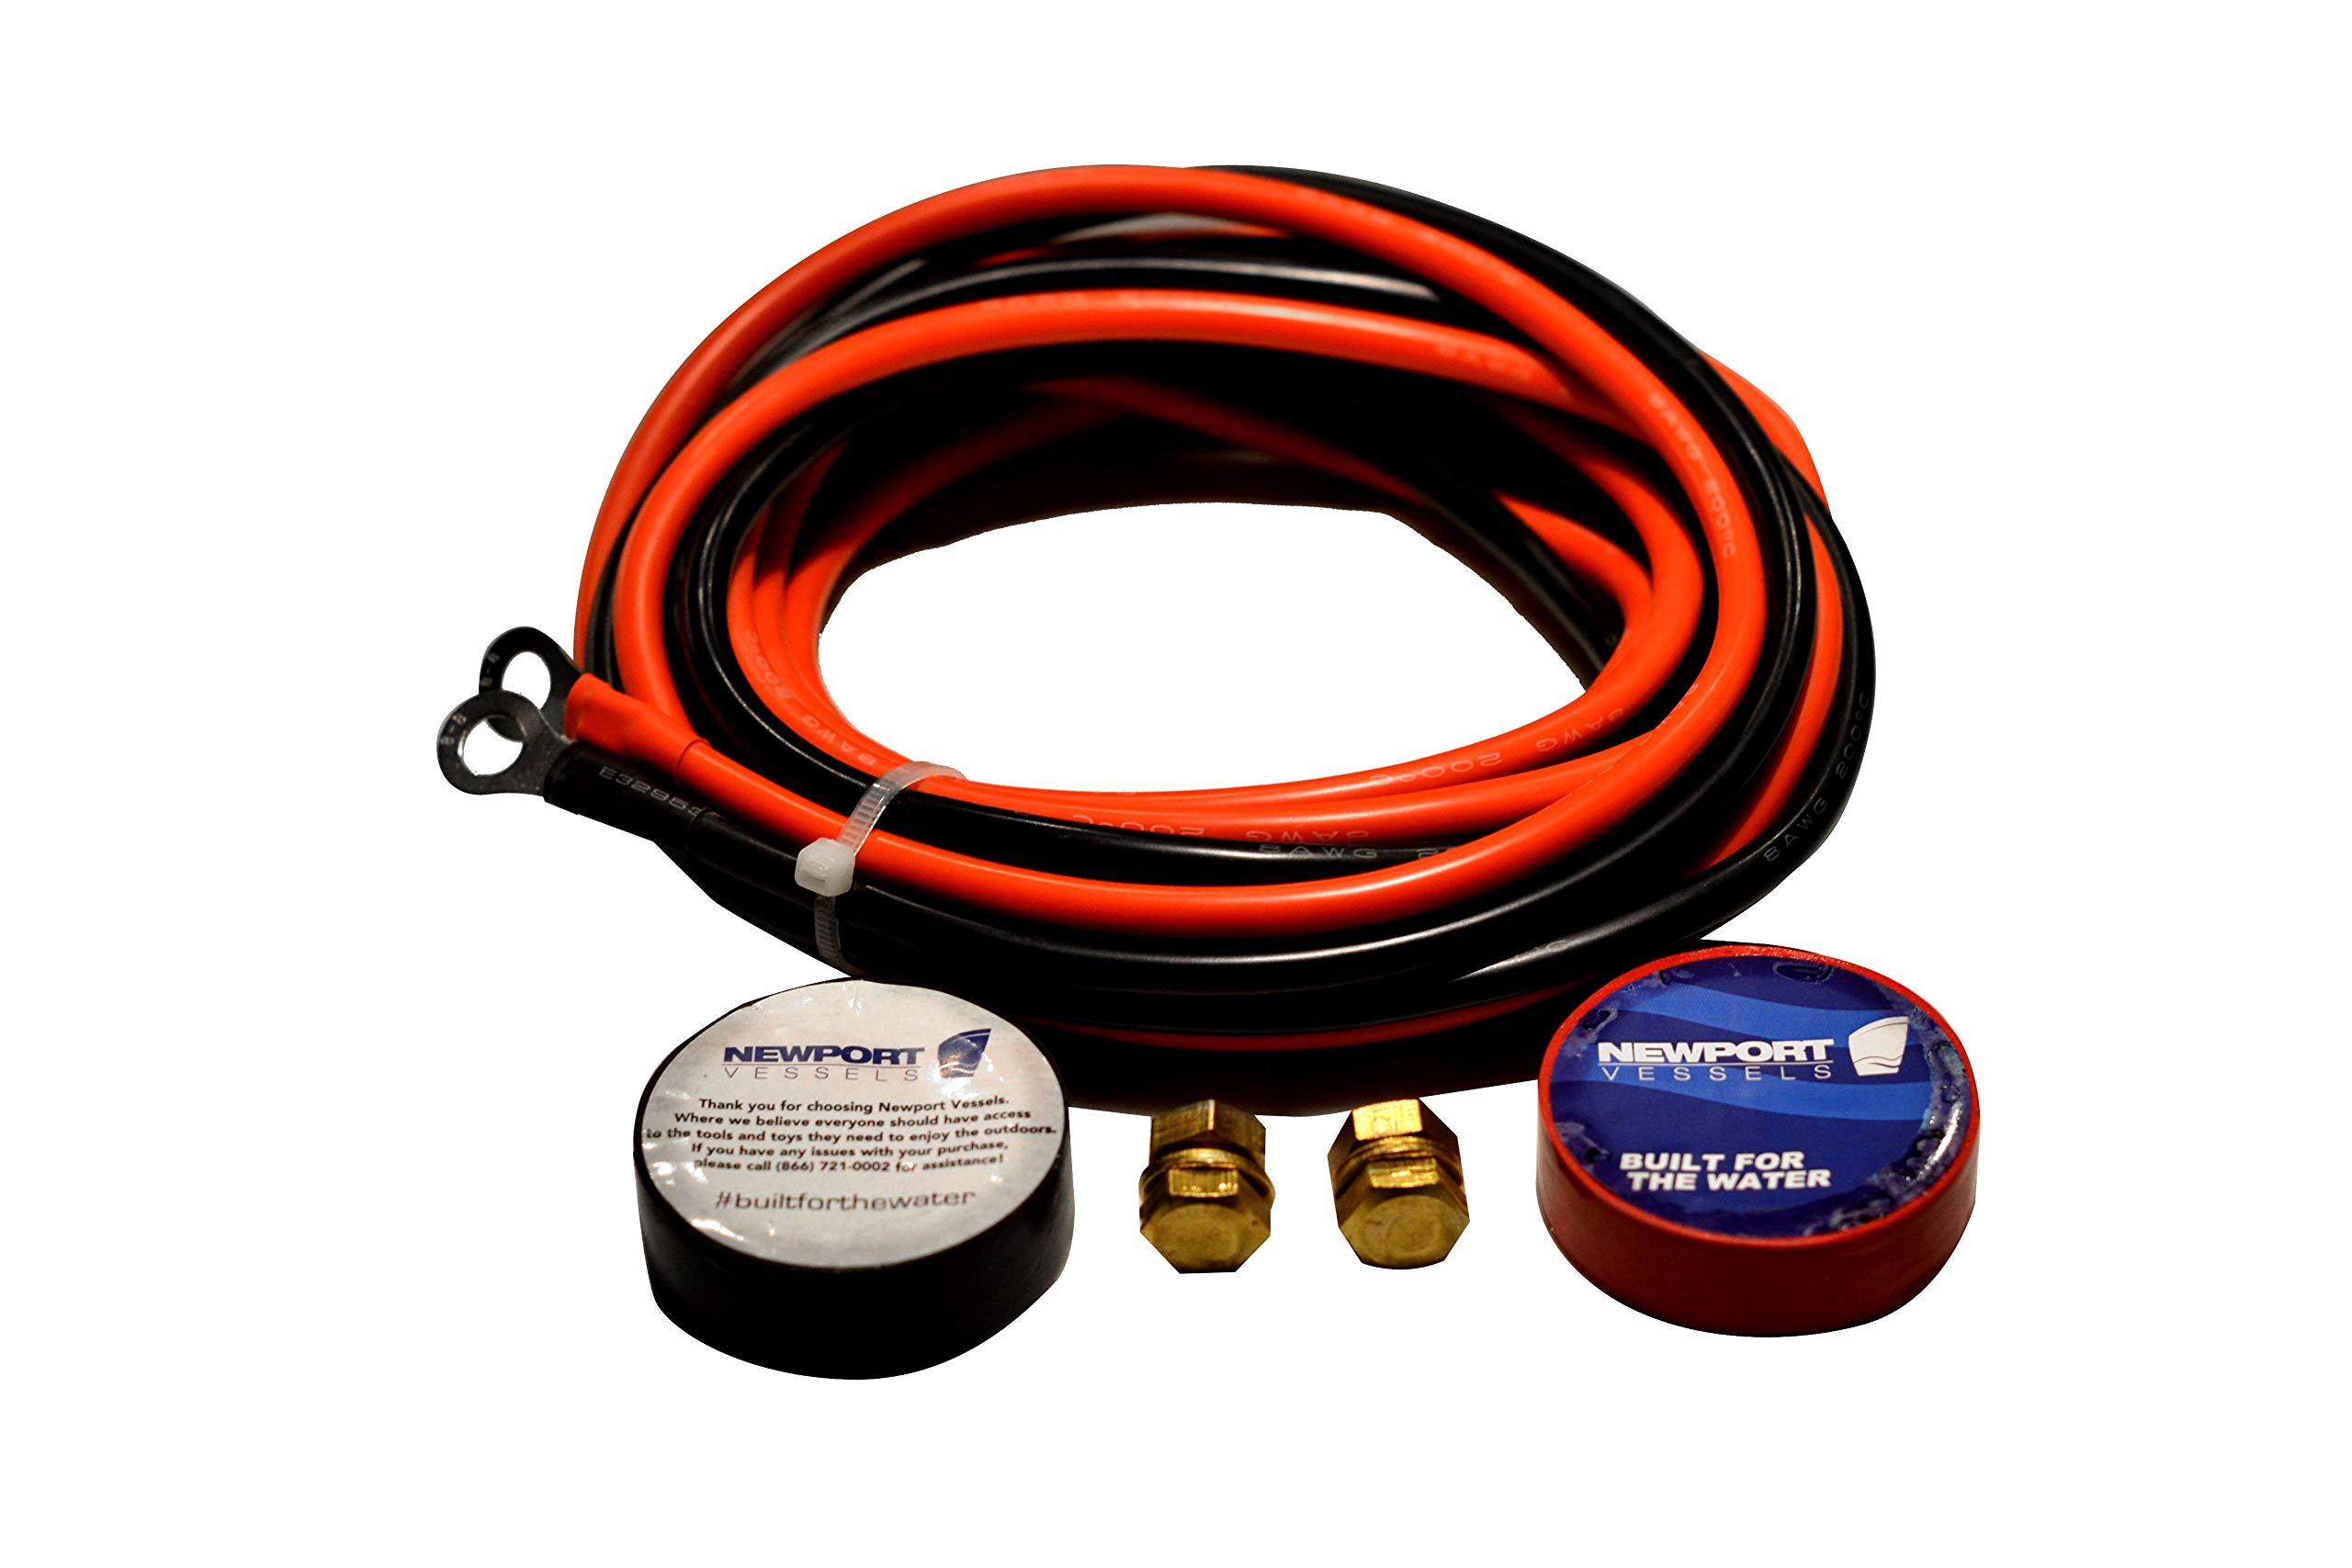 Newport Vessels Trolling Motor Battery Cable Extension Kit, 5-Feet